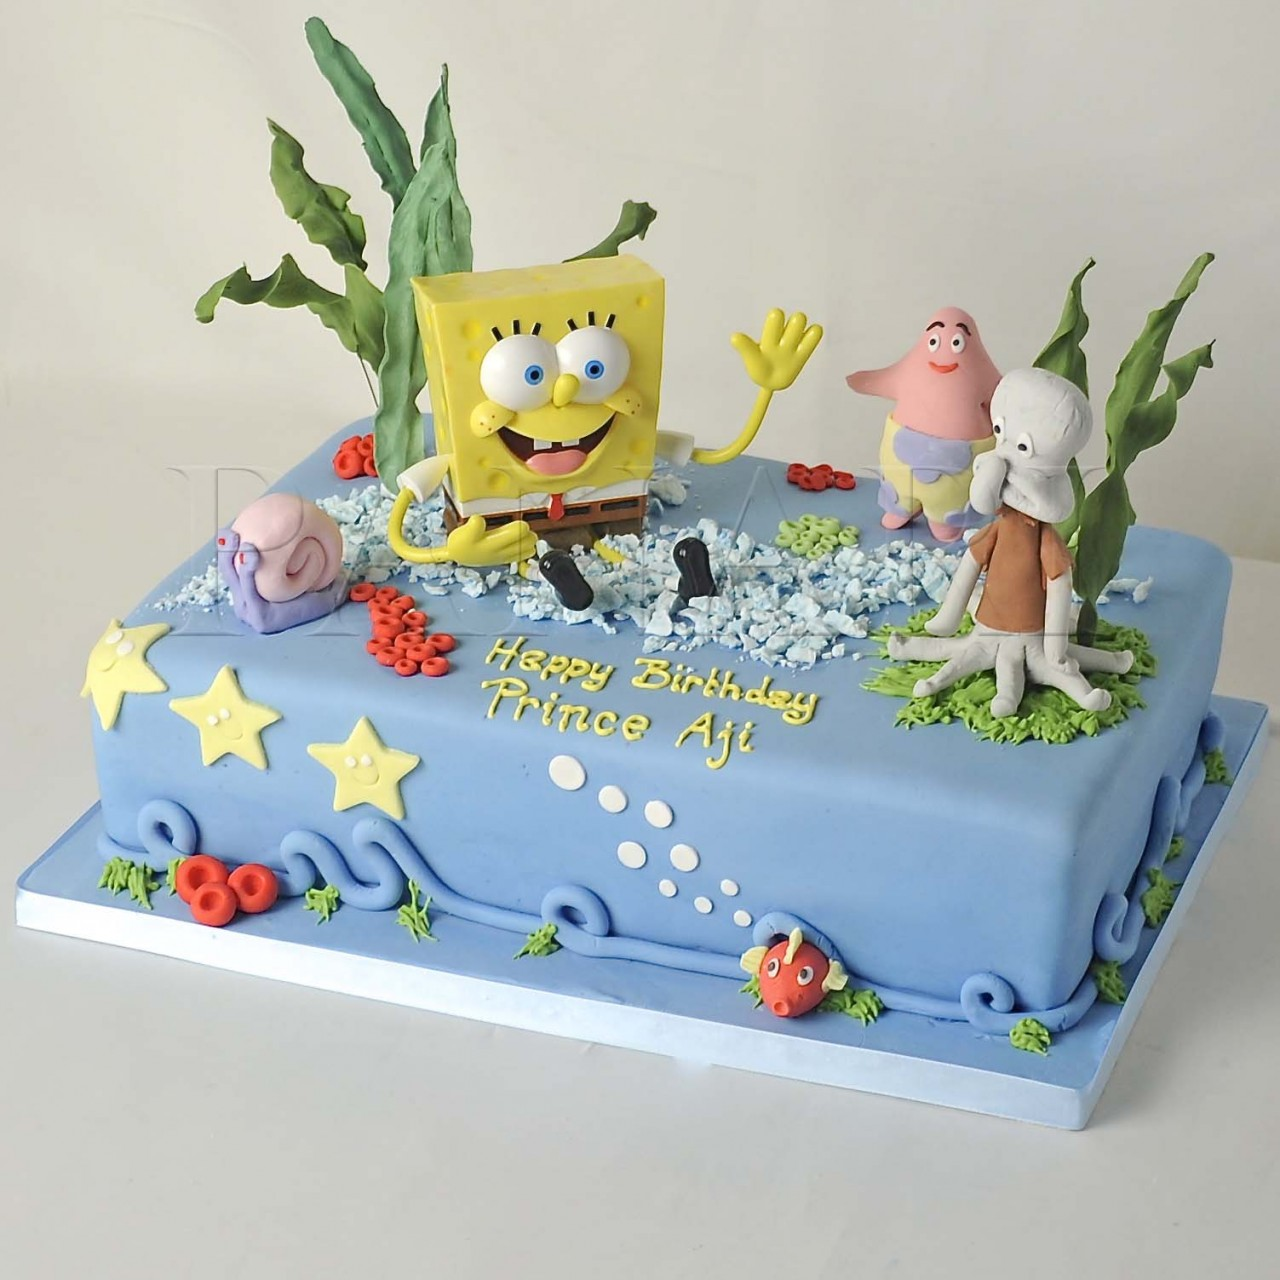 Spongebob Cake Ideas With Fondant